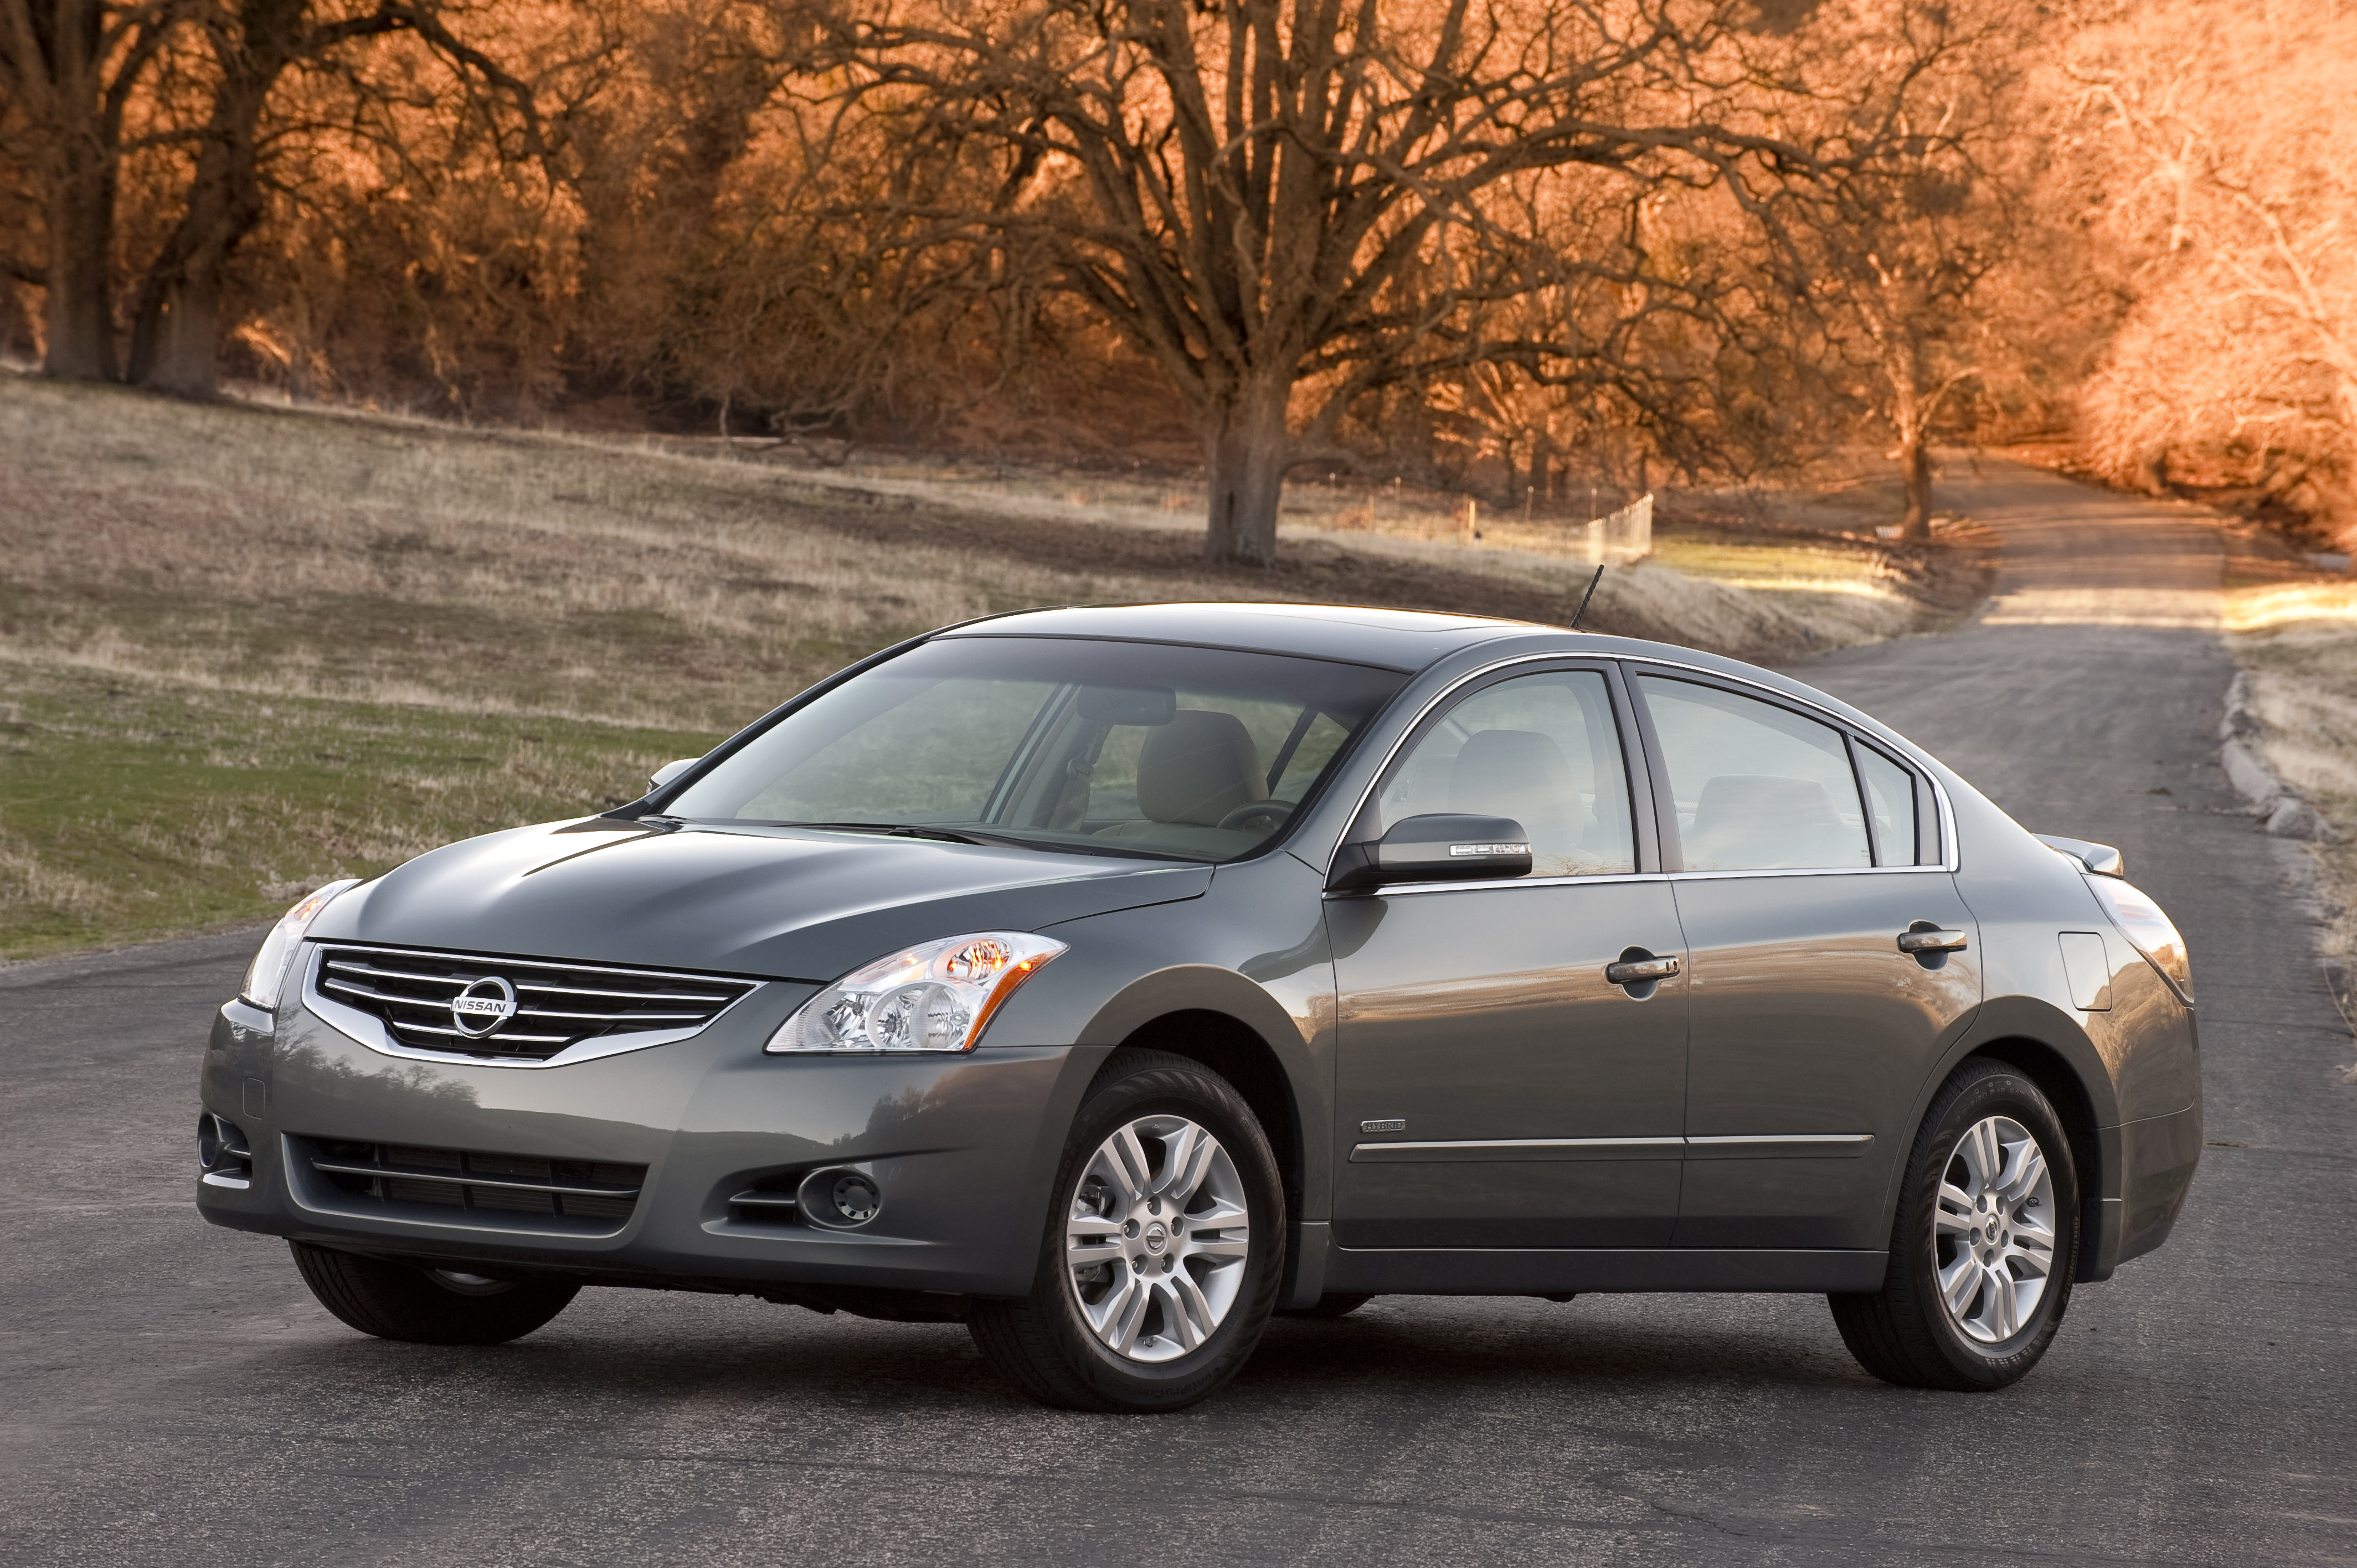 Nissan Altima Hybrid, 2010